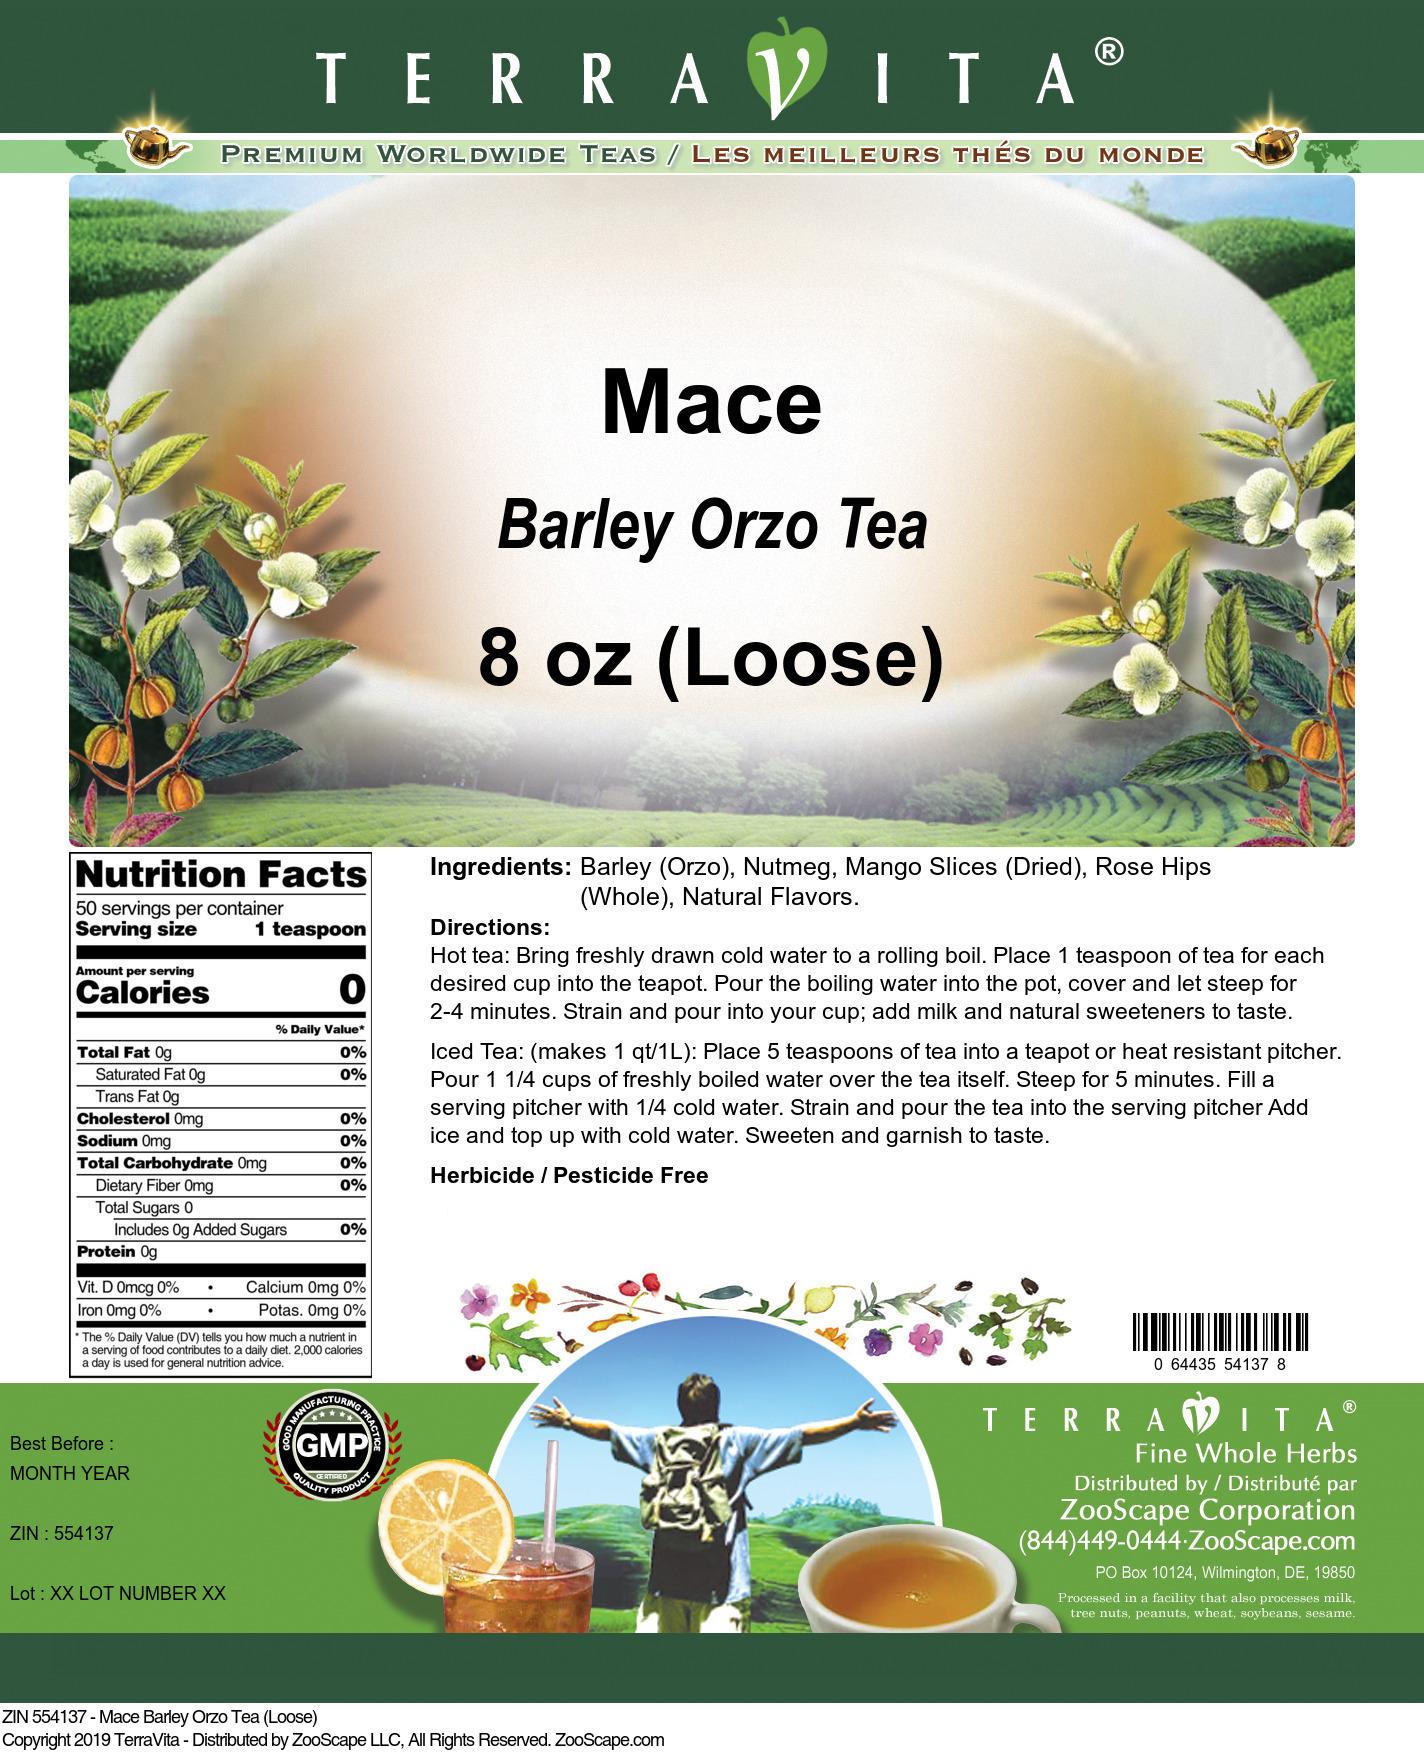 Mace Barley Orzo